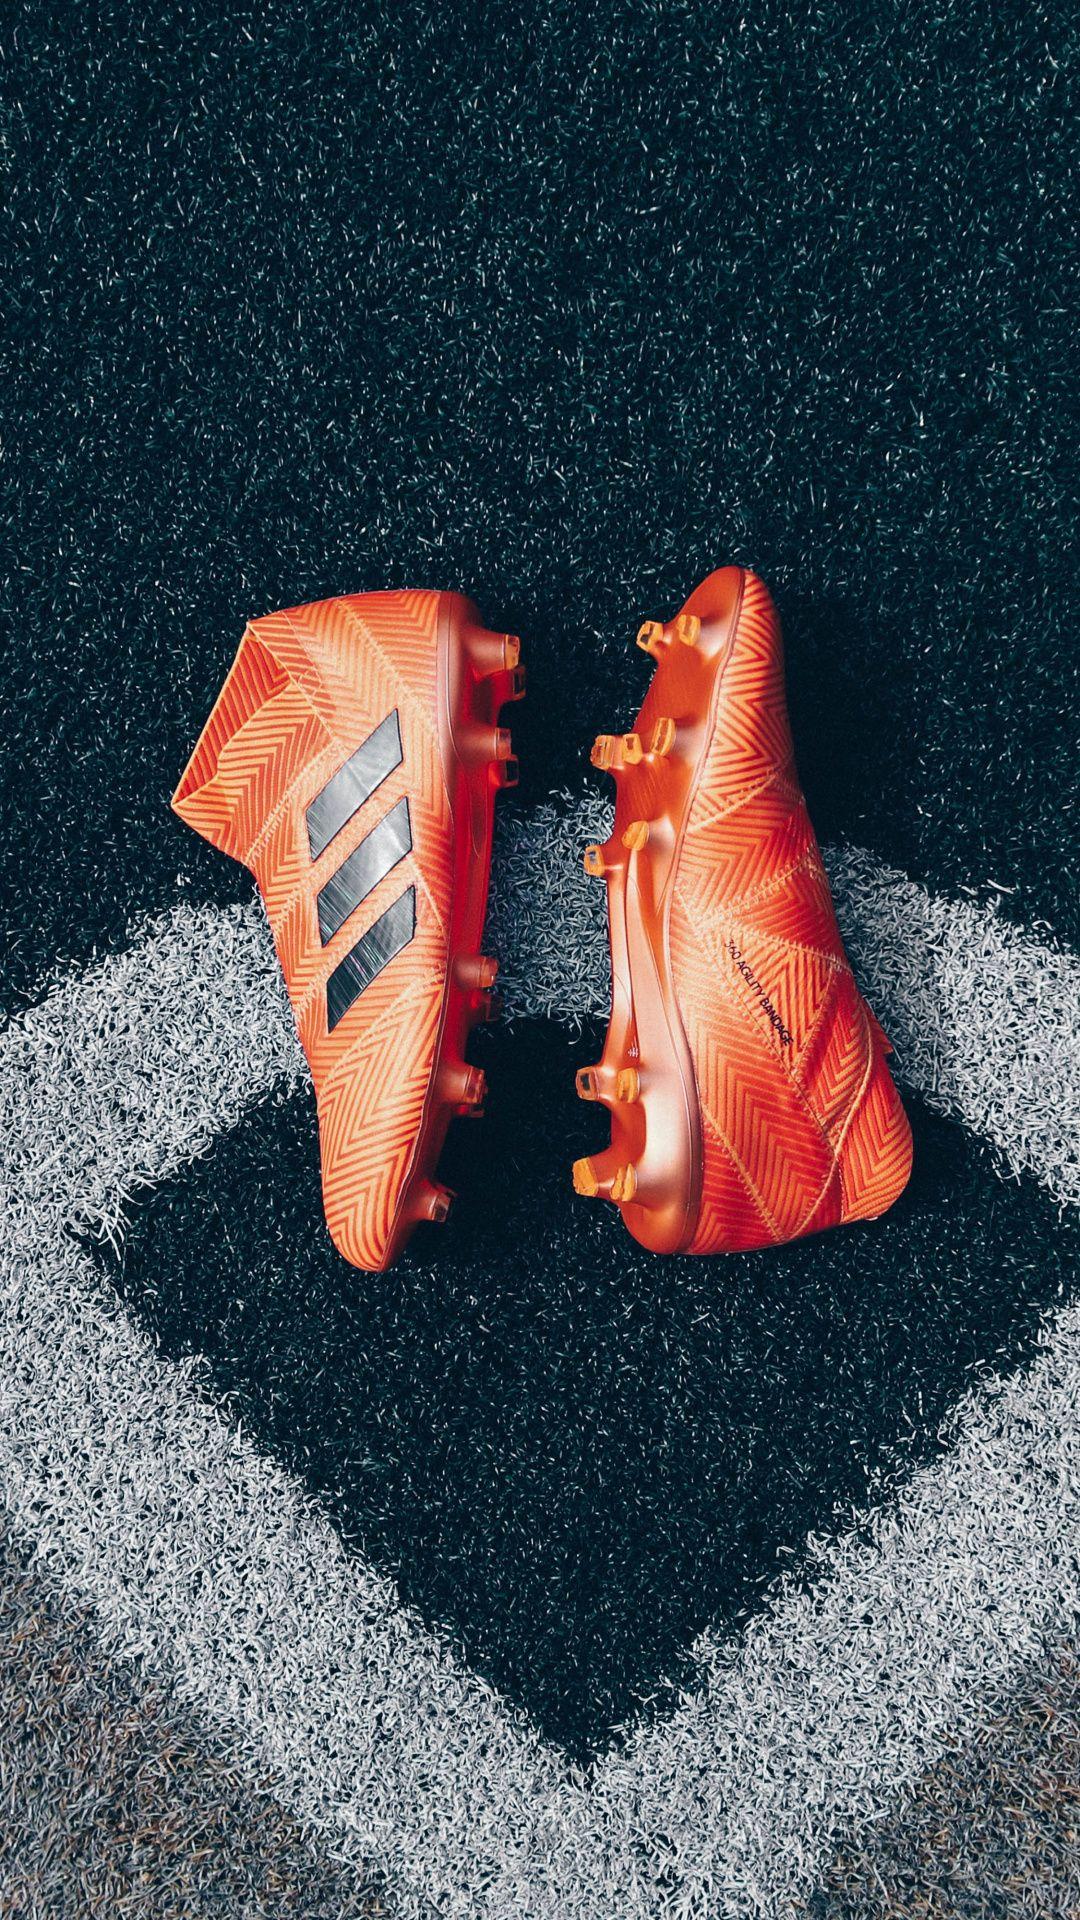 Wallpapers Red Footwear Football Shoe Leg Cool Football Boots Football Football Shoes